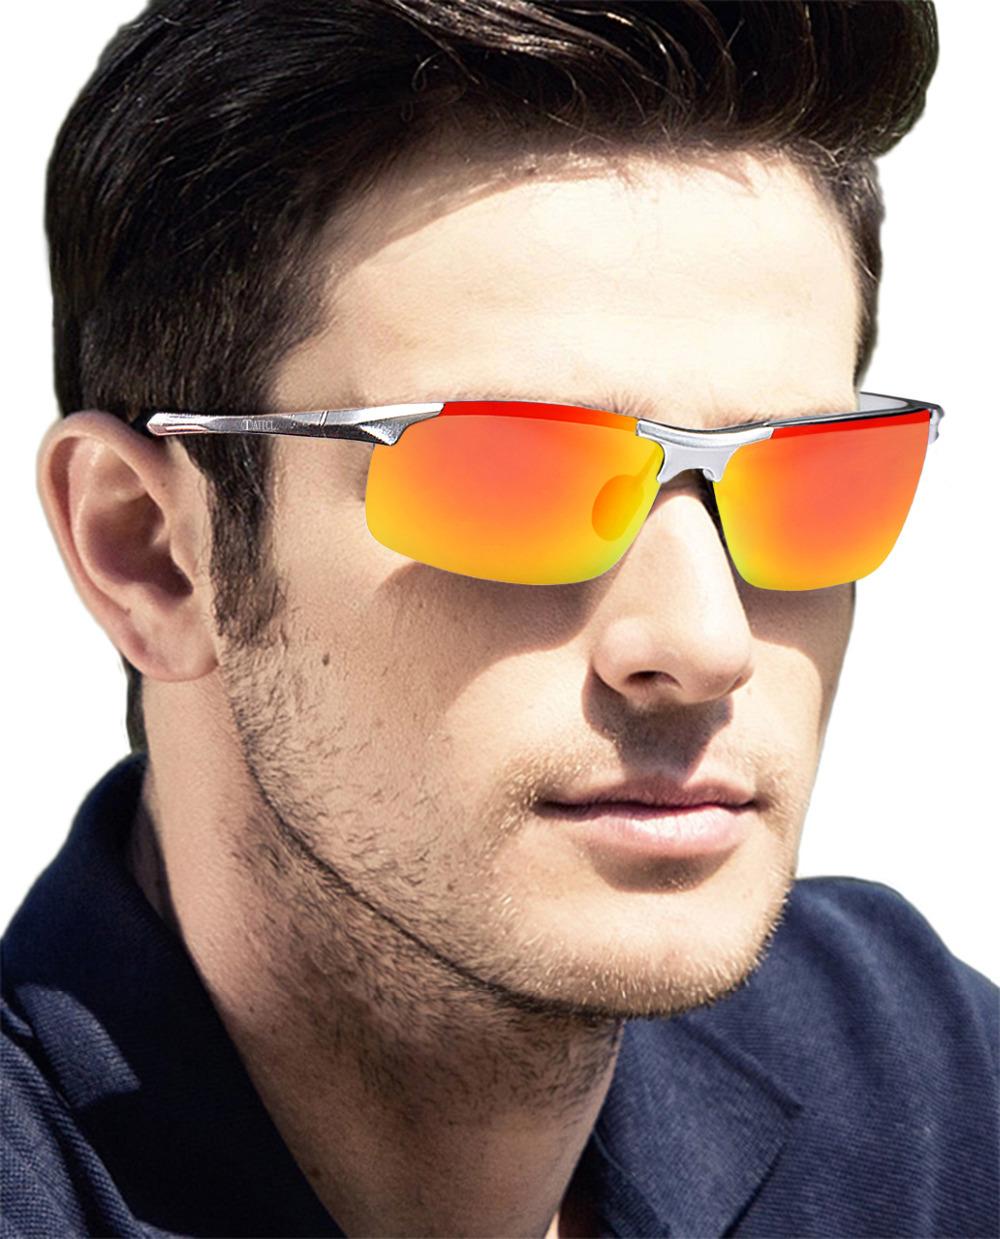 0b6e20e2d46 Attcl Men s Hot Fashion Driving Polarized Sunglasses